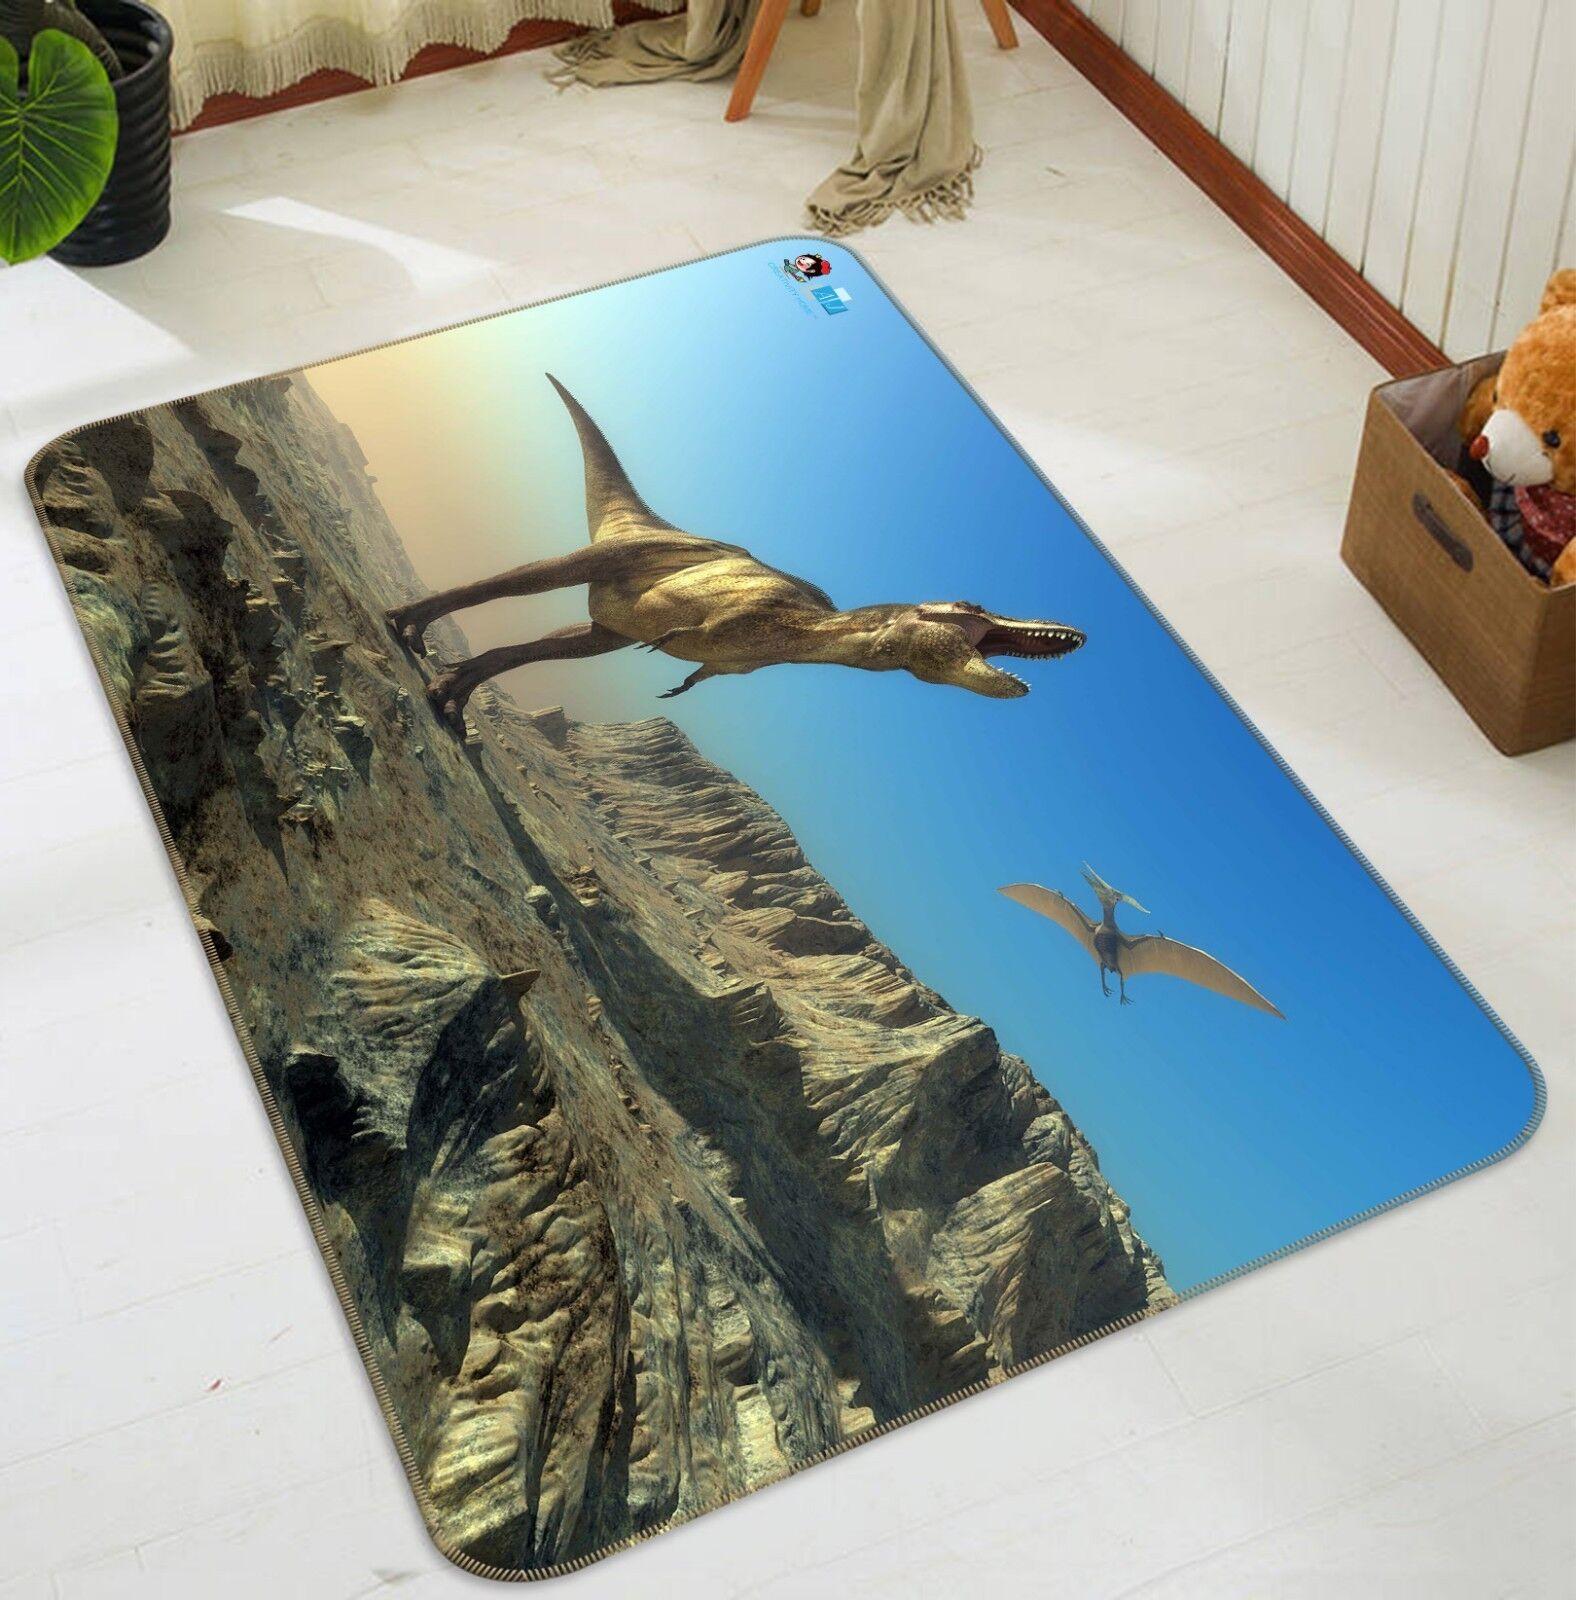 3D Dinosauro 268 Pavimento Antiscivolo Tappeti Elegante Tappeto IT Cobb